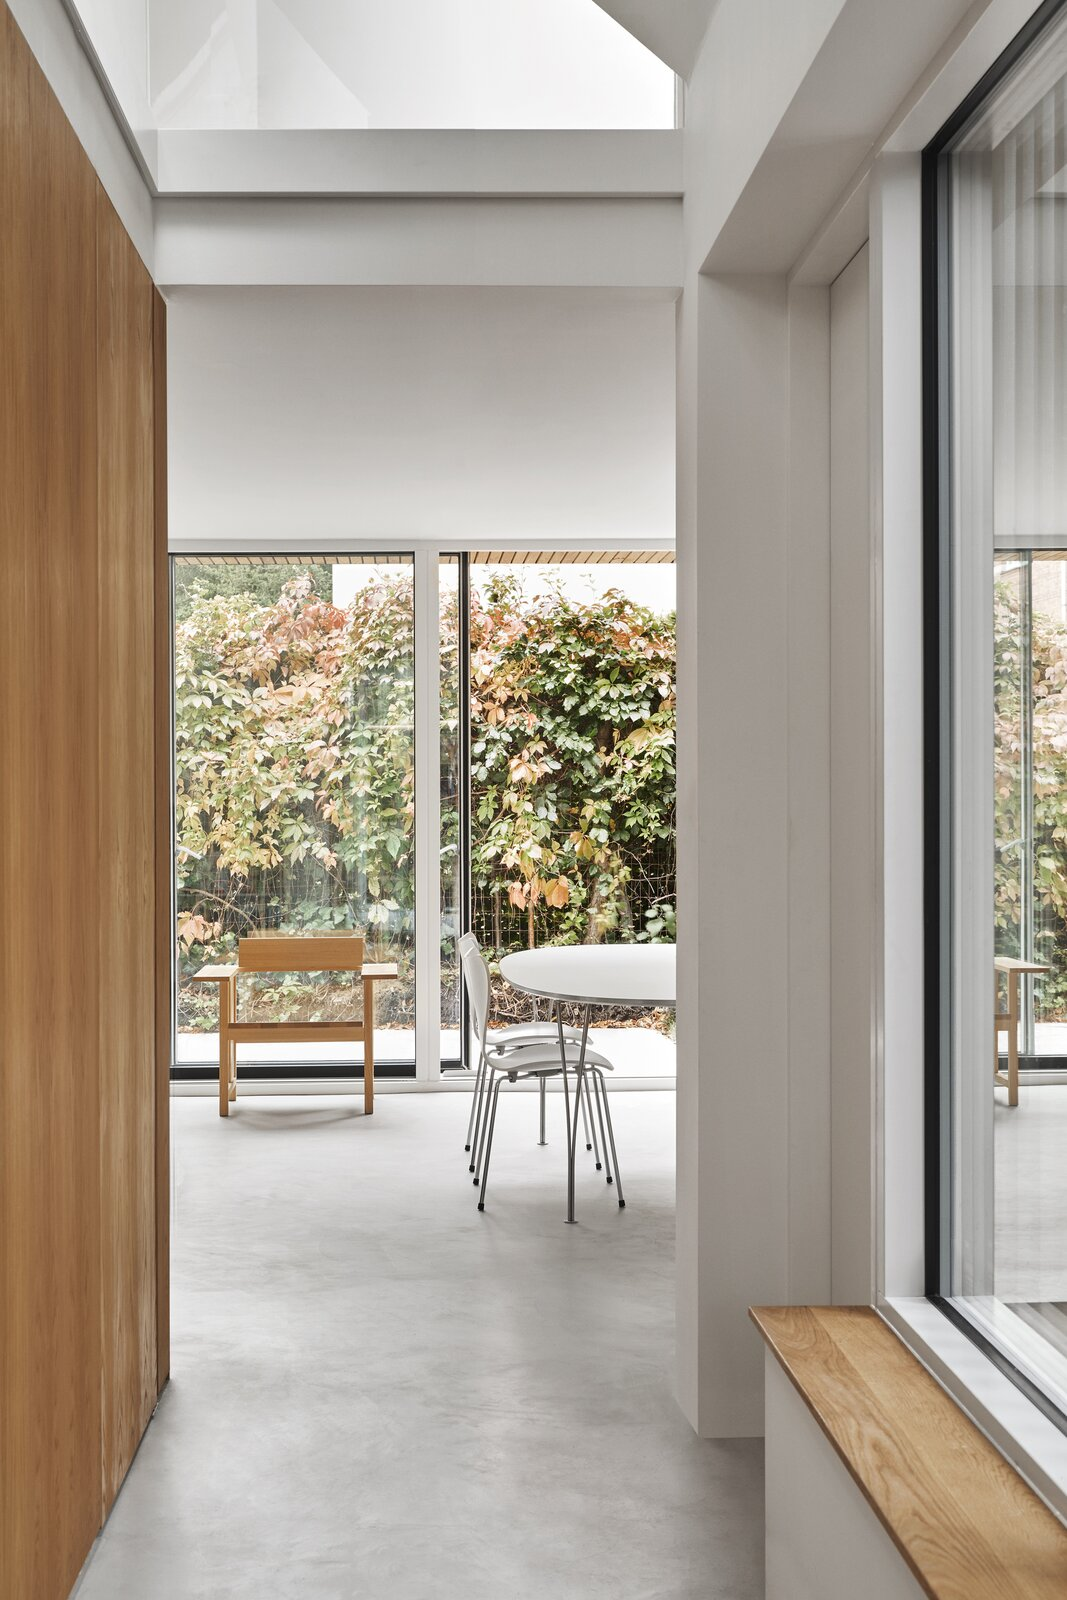 Villa Bülowsvej by EFFEKT hallway with view into the dining room